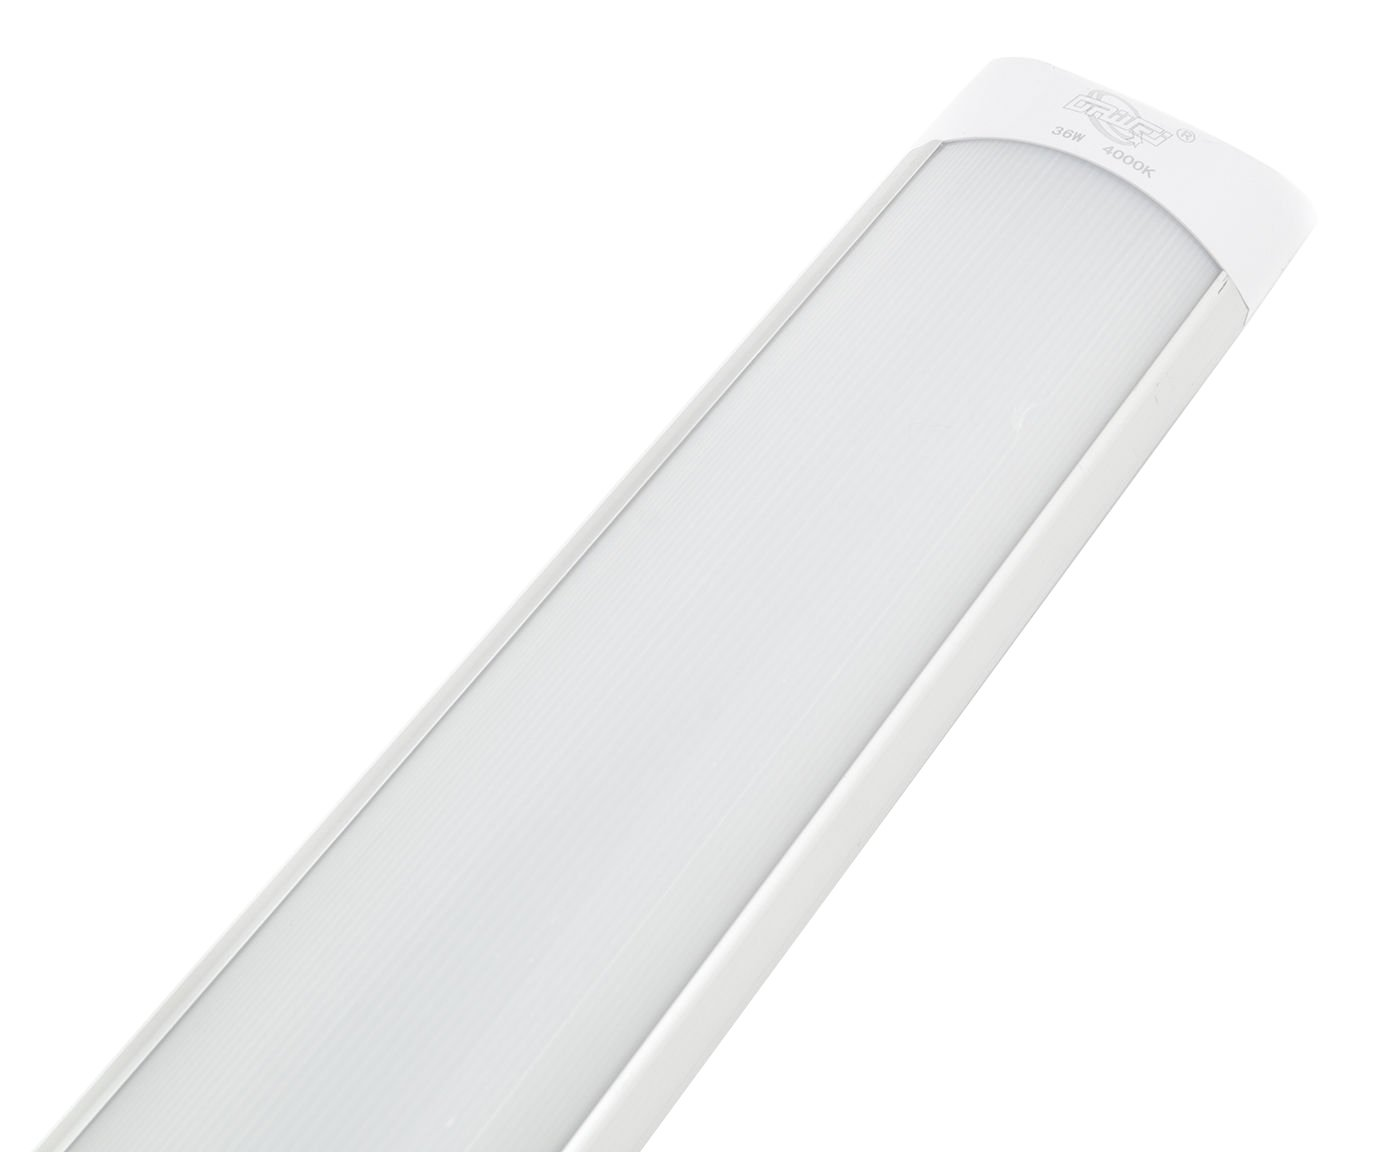 Plafoniera led w watt luce fredda cm slim smd soffitto v